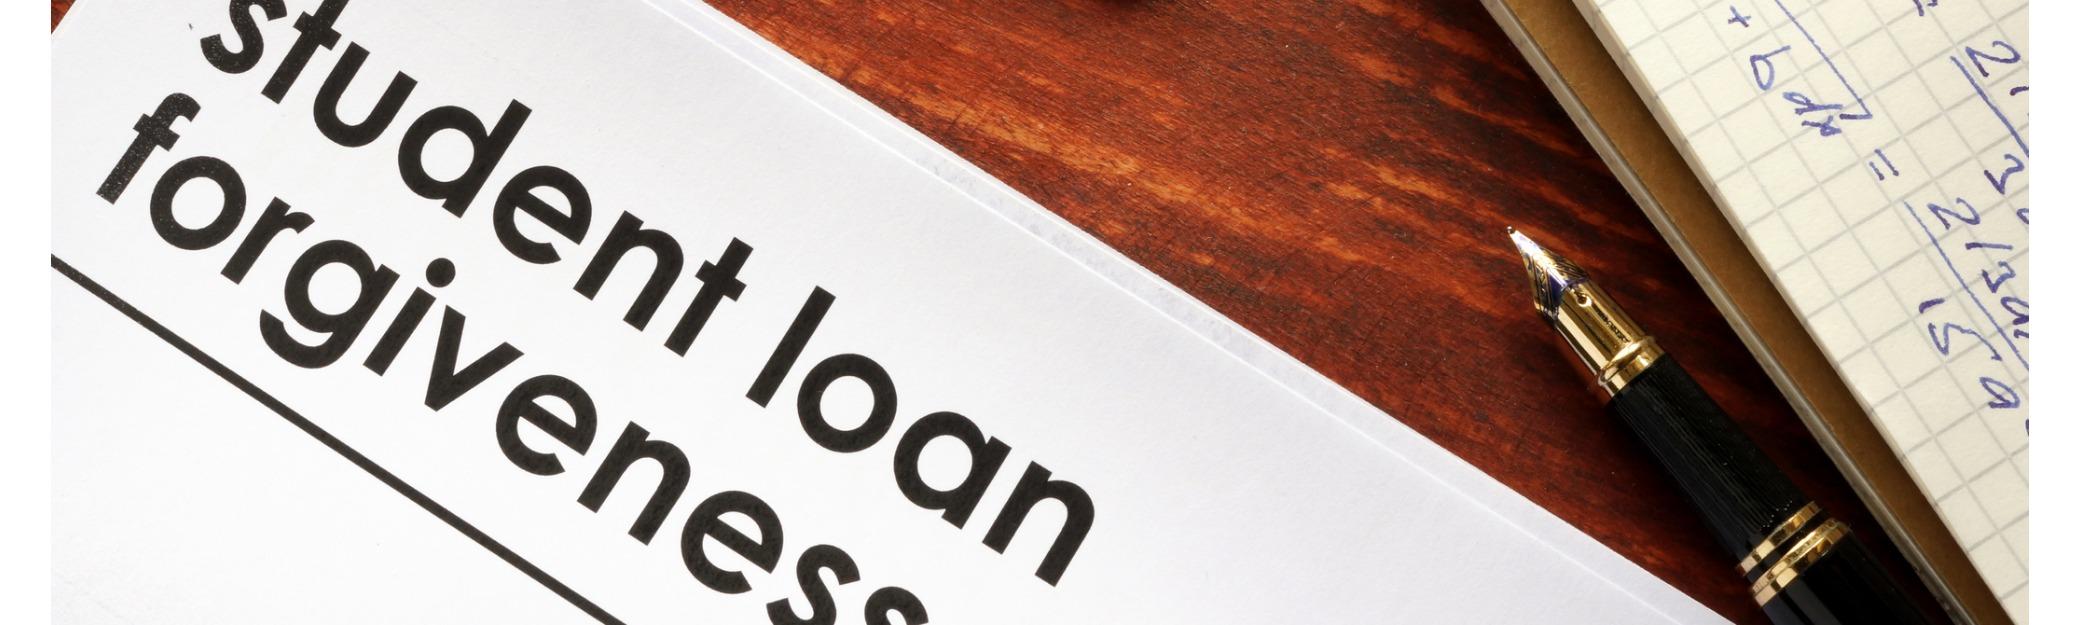 loan forgiveness large.jpg